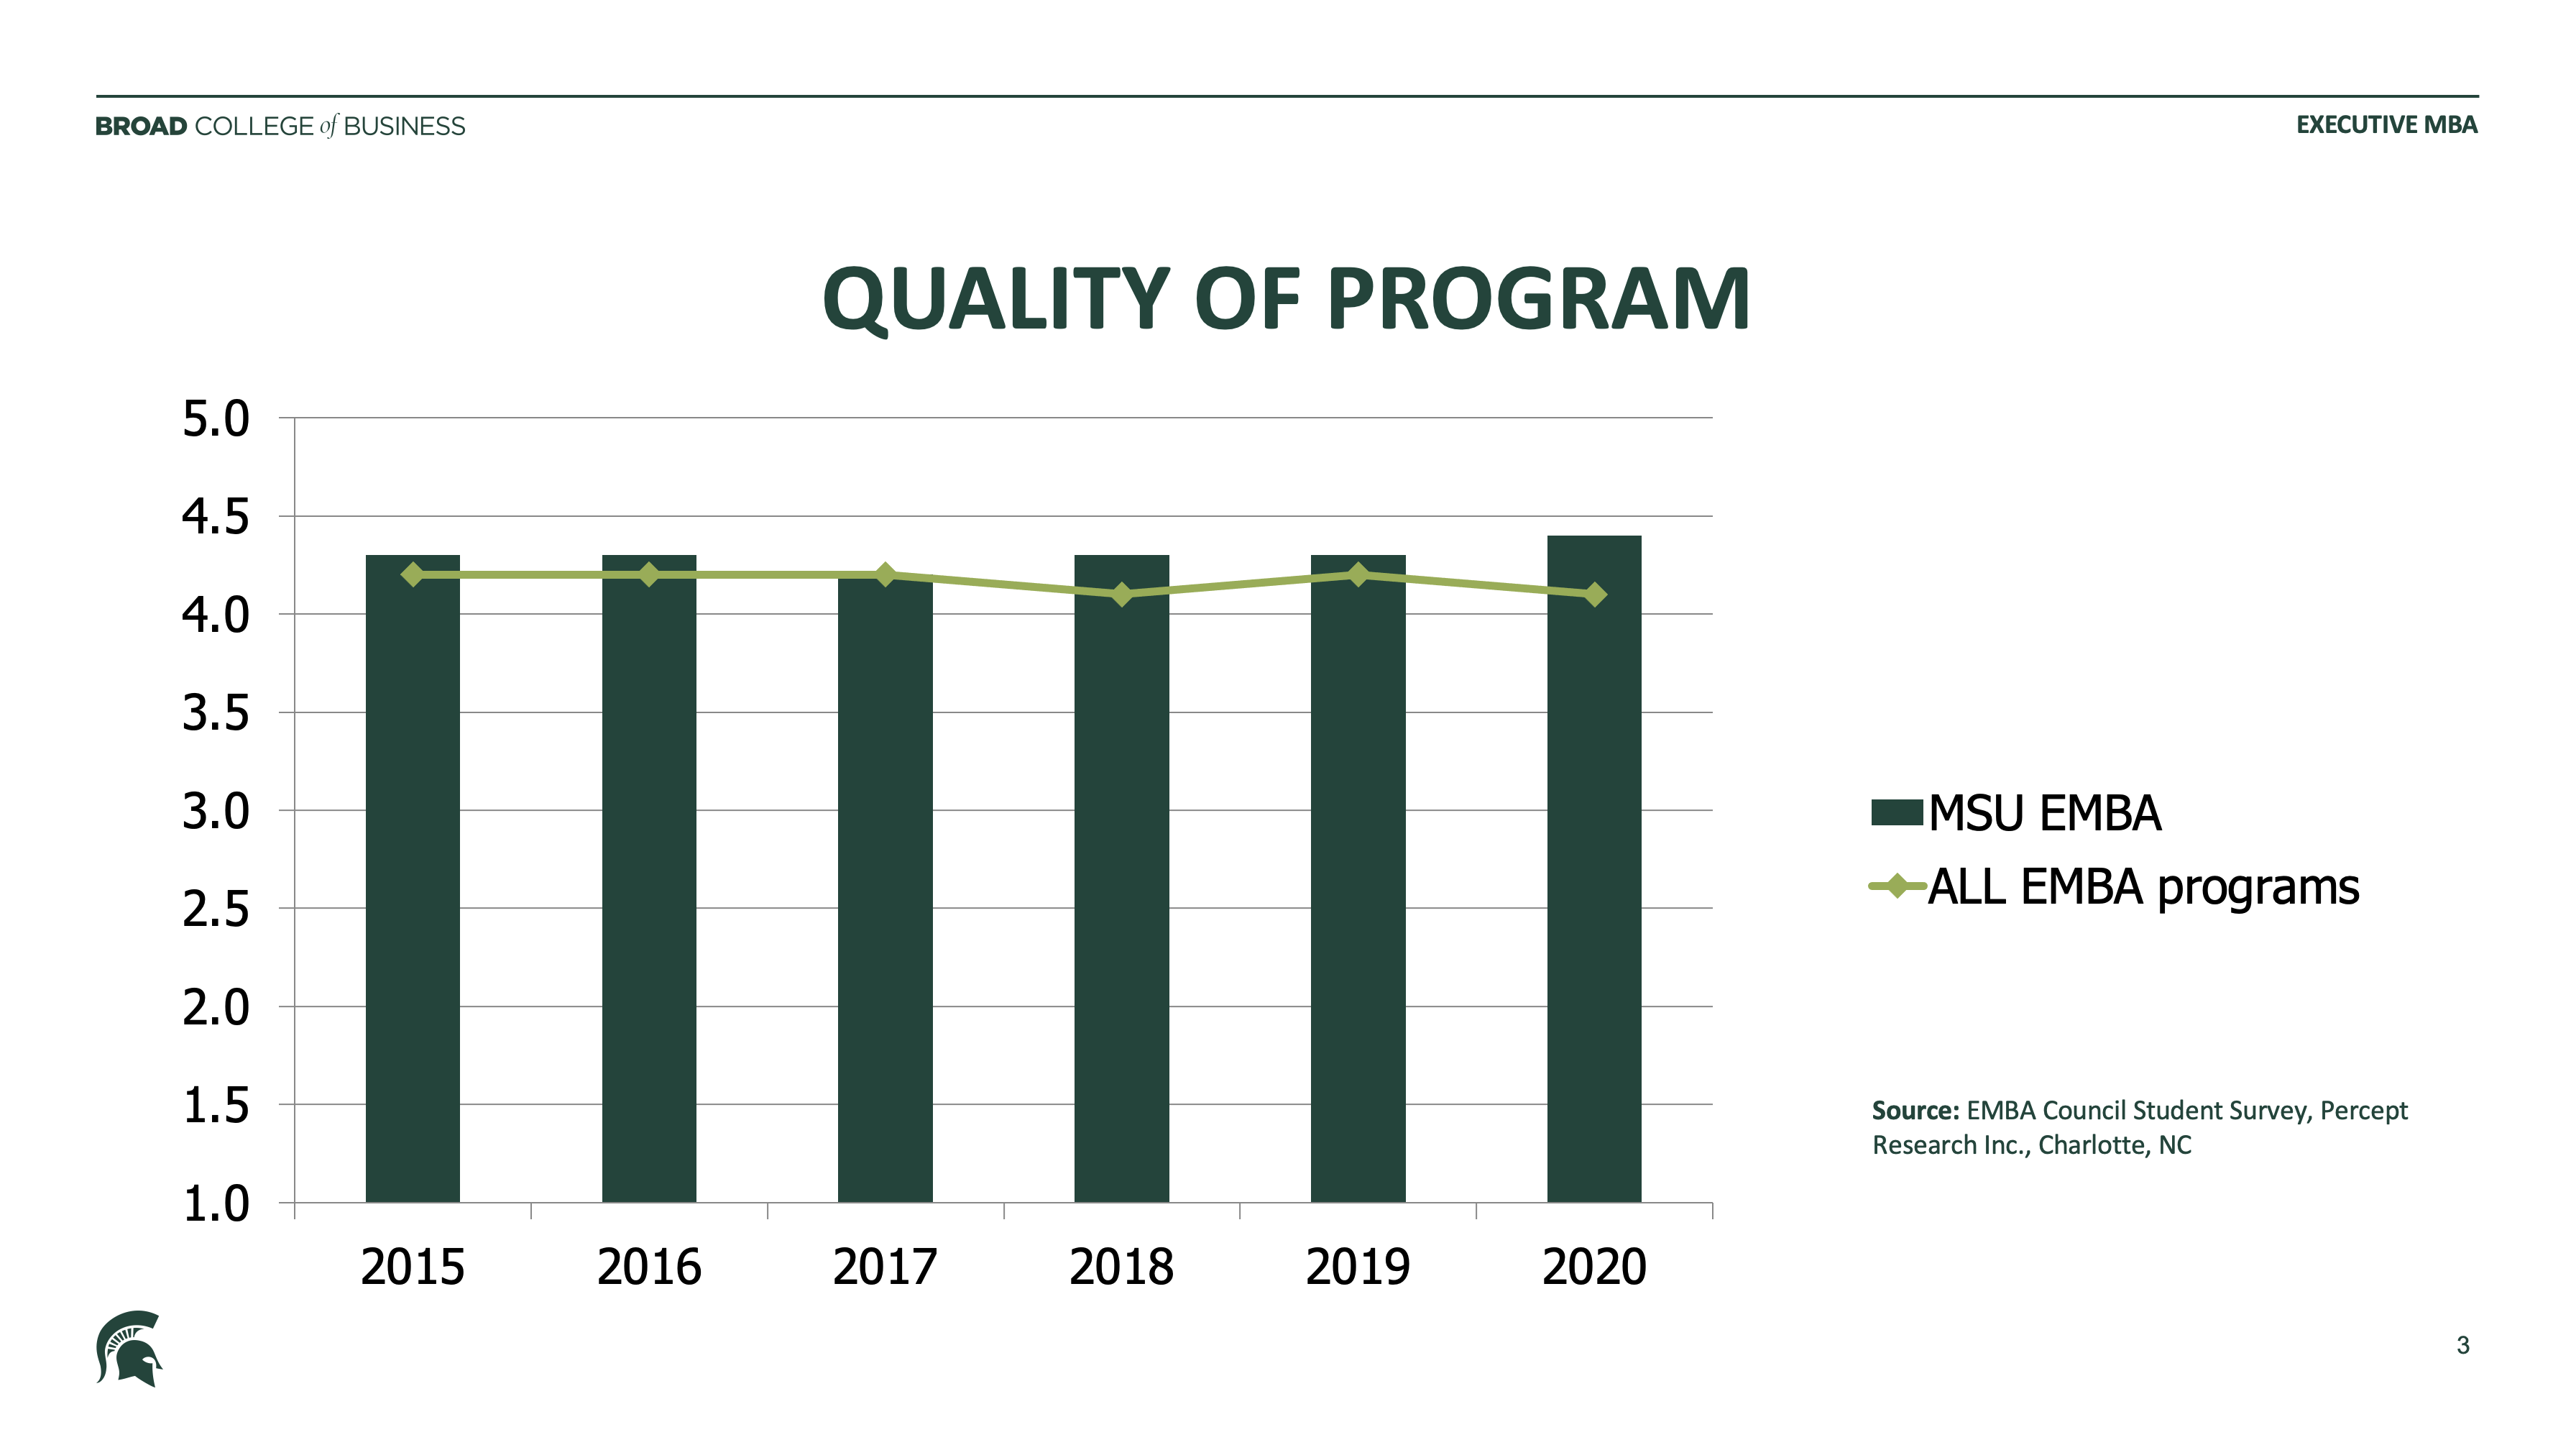 Quality Of Program bar graph